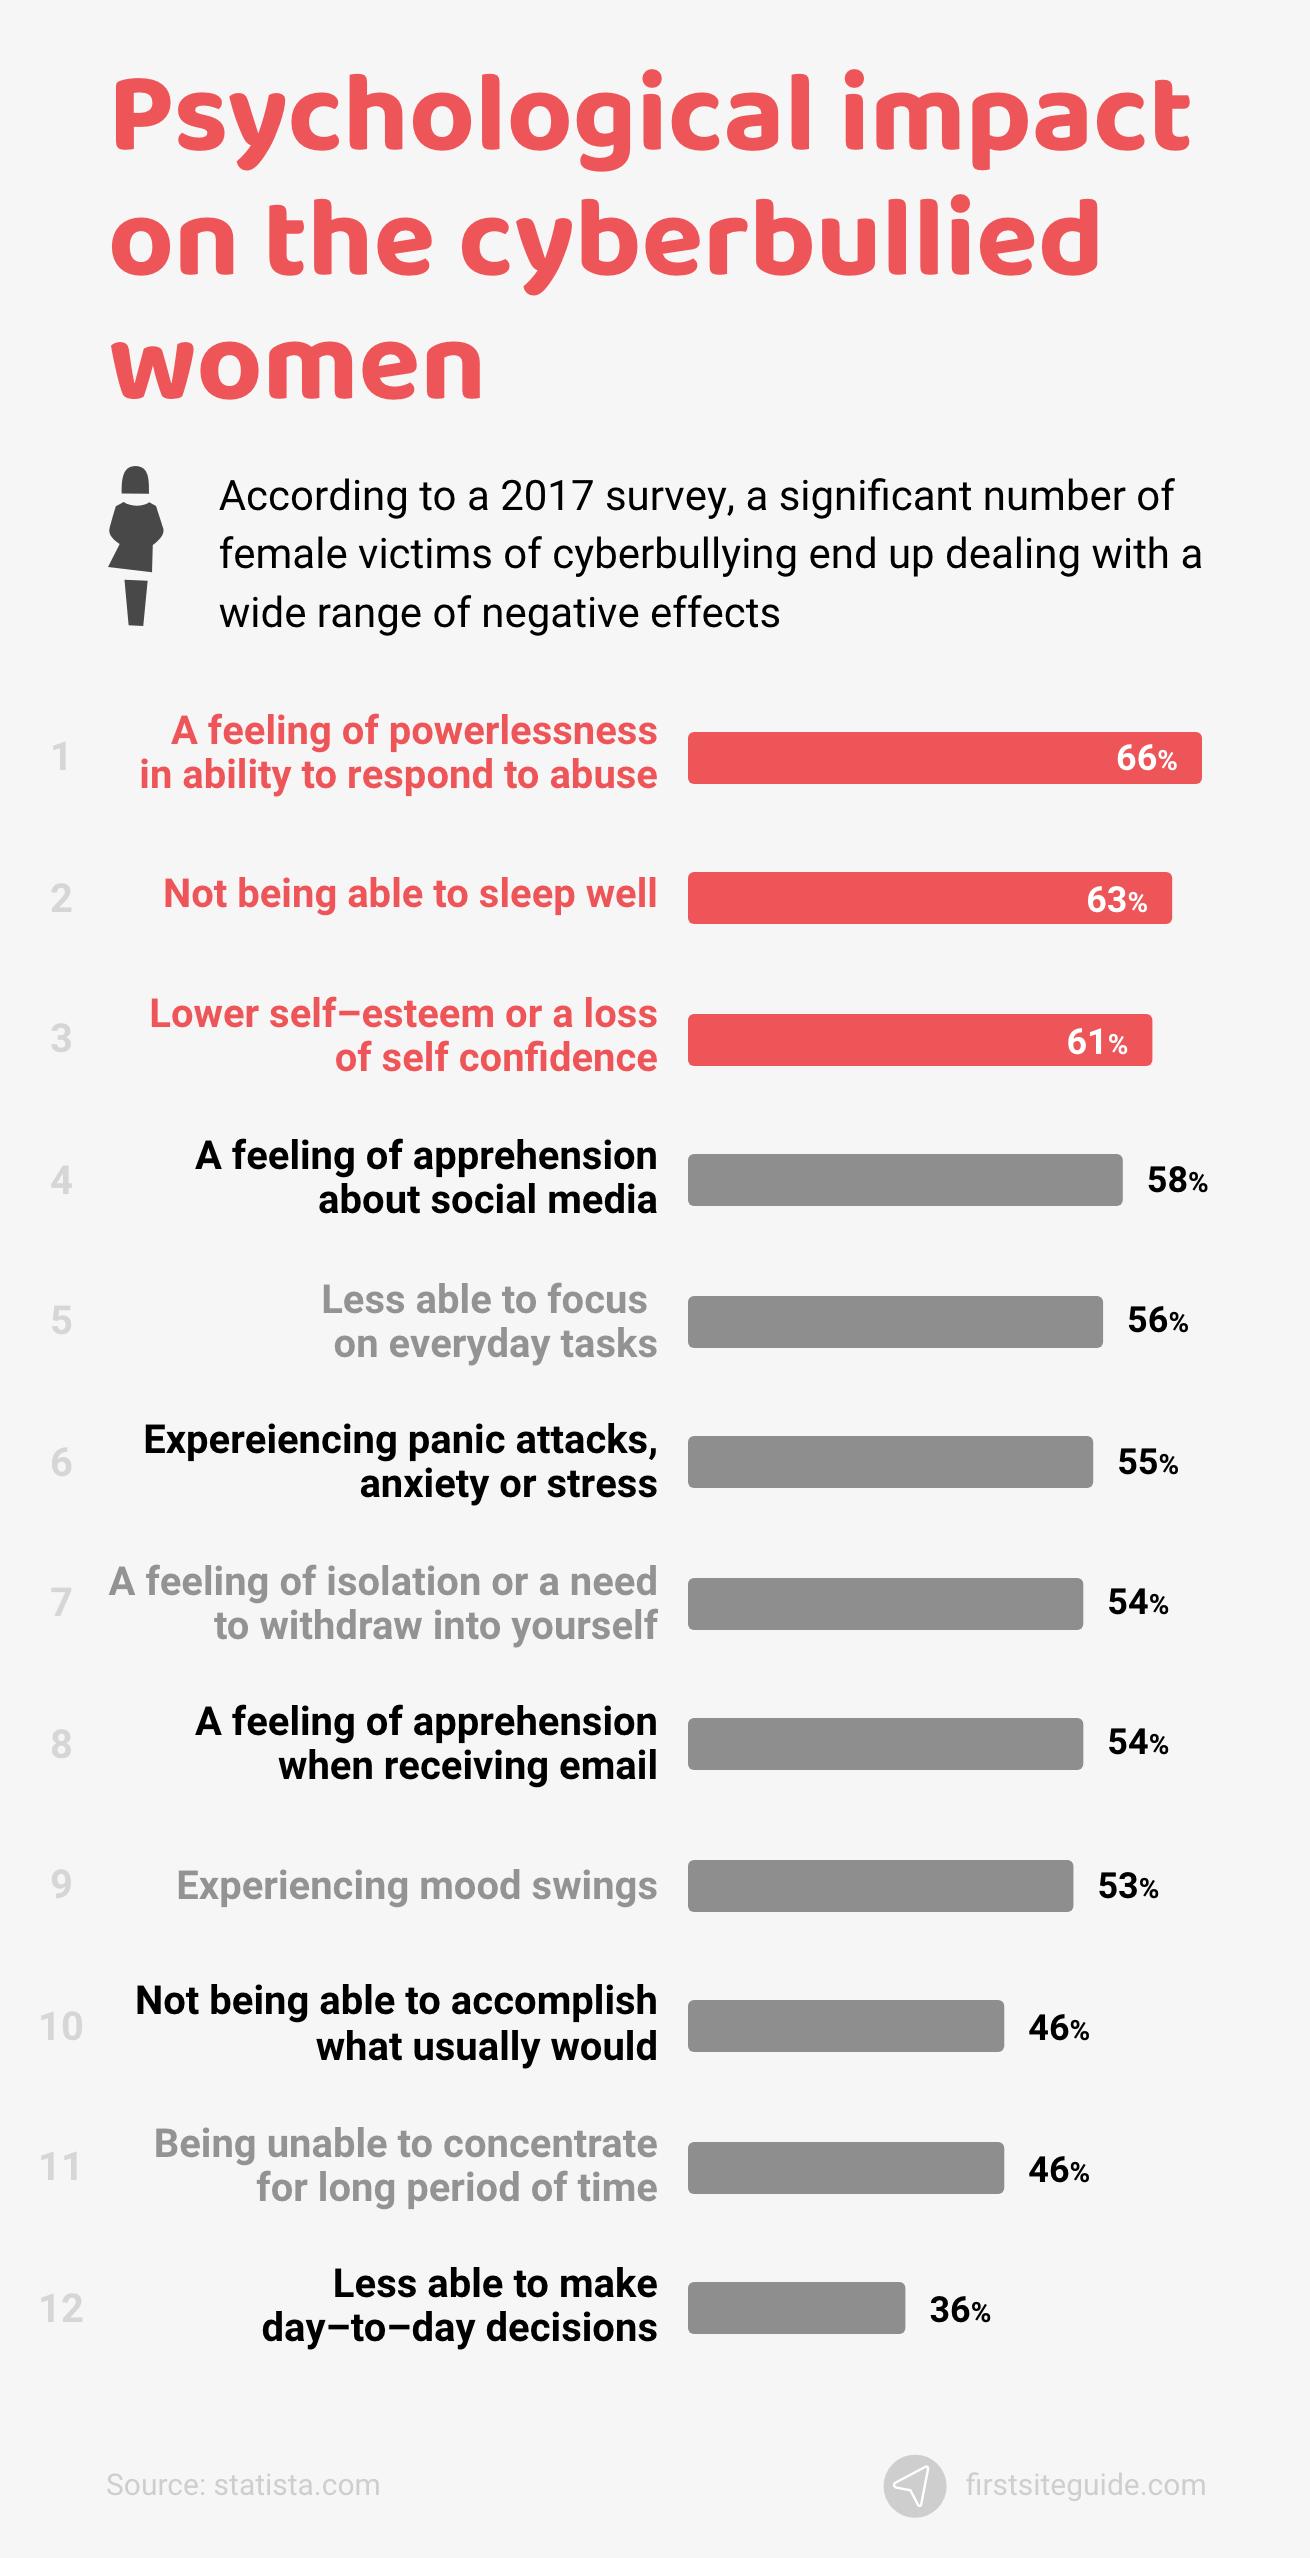 Psychological impact on the cyberbullied women